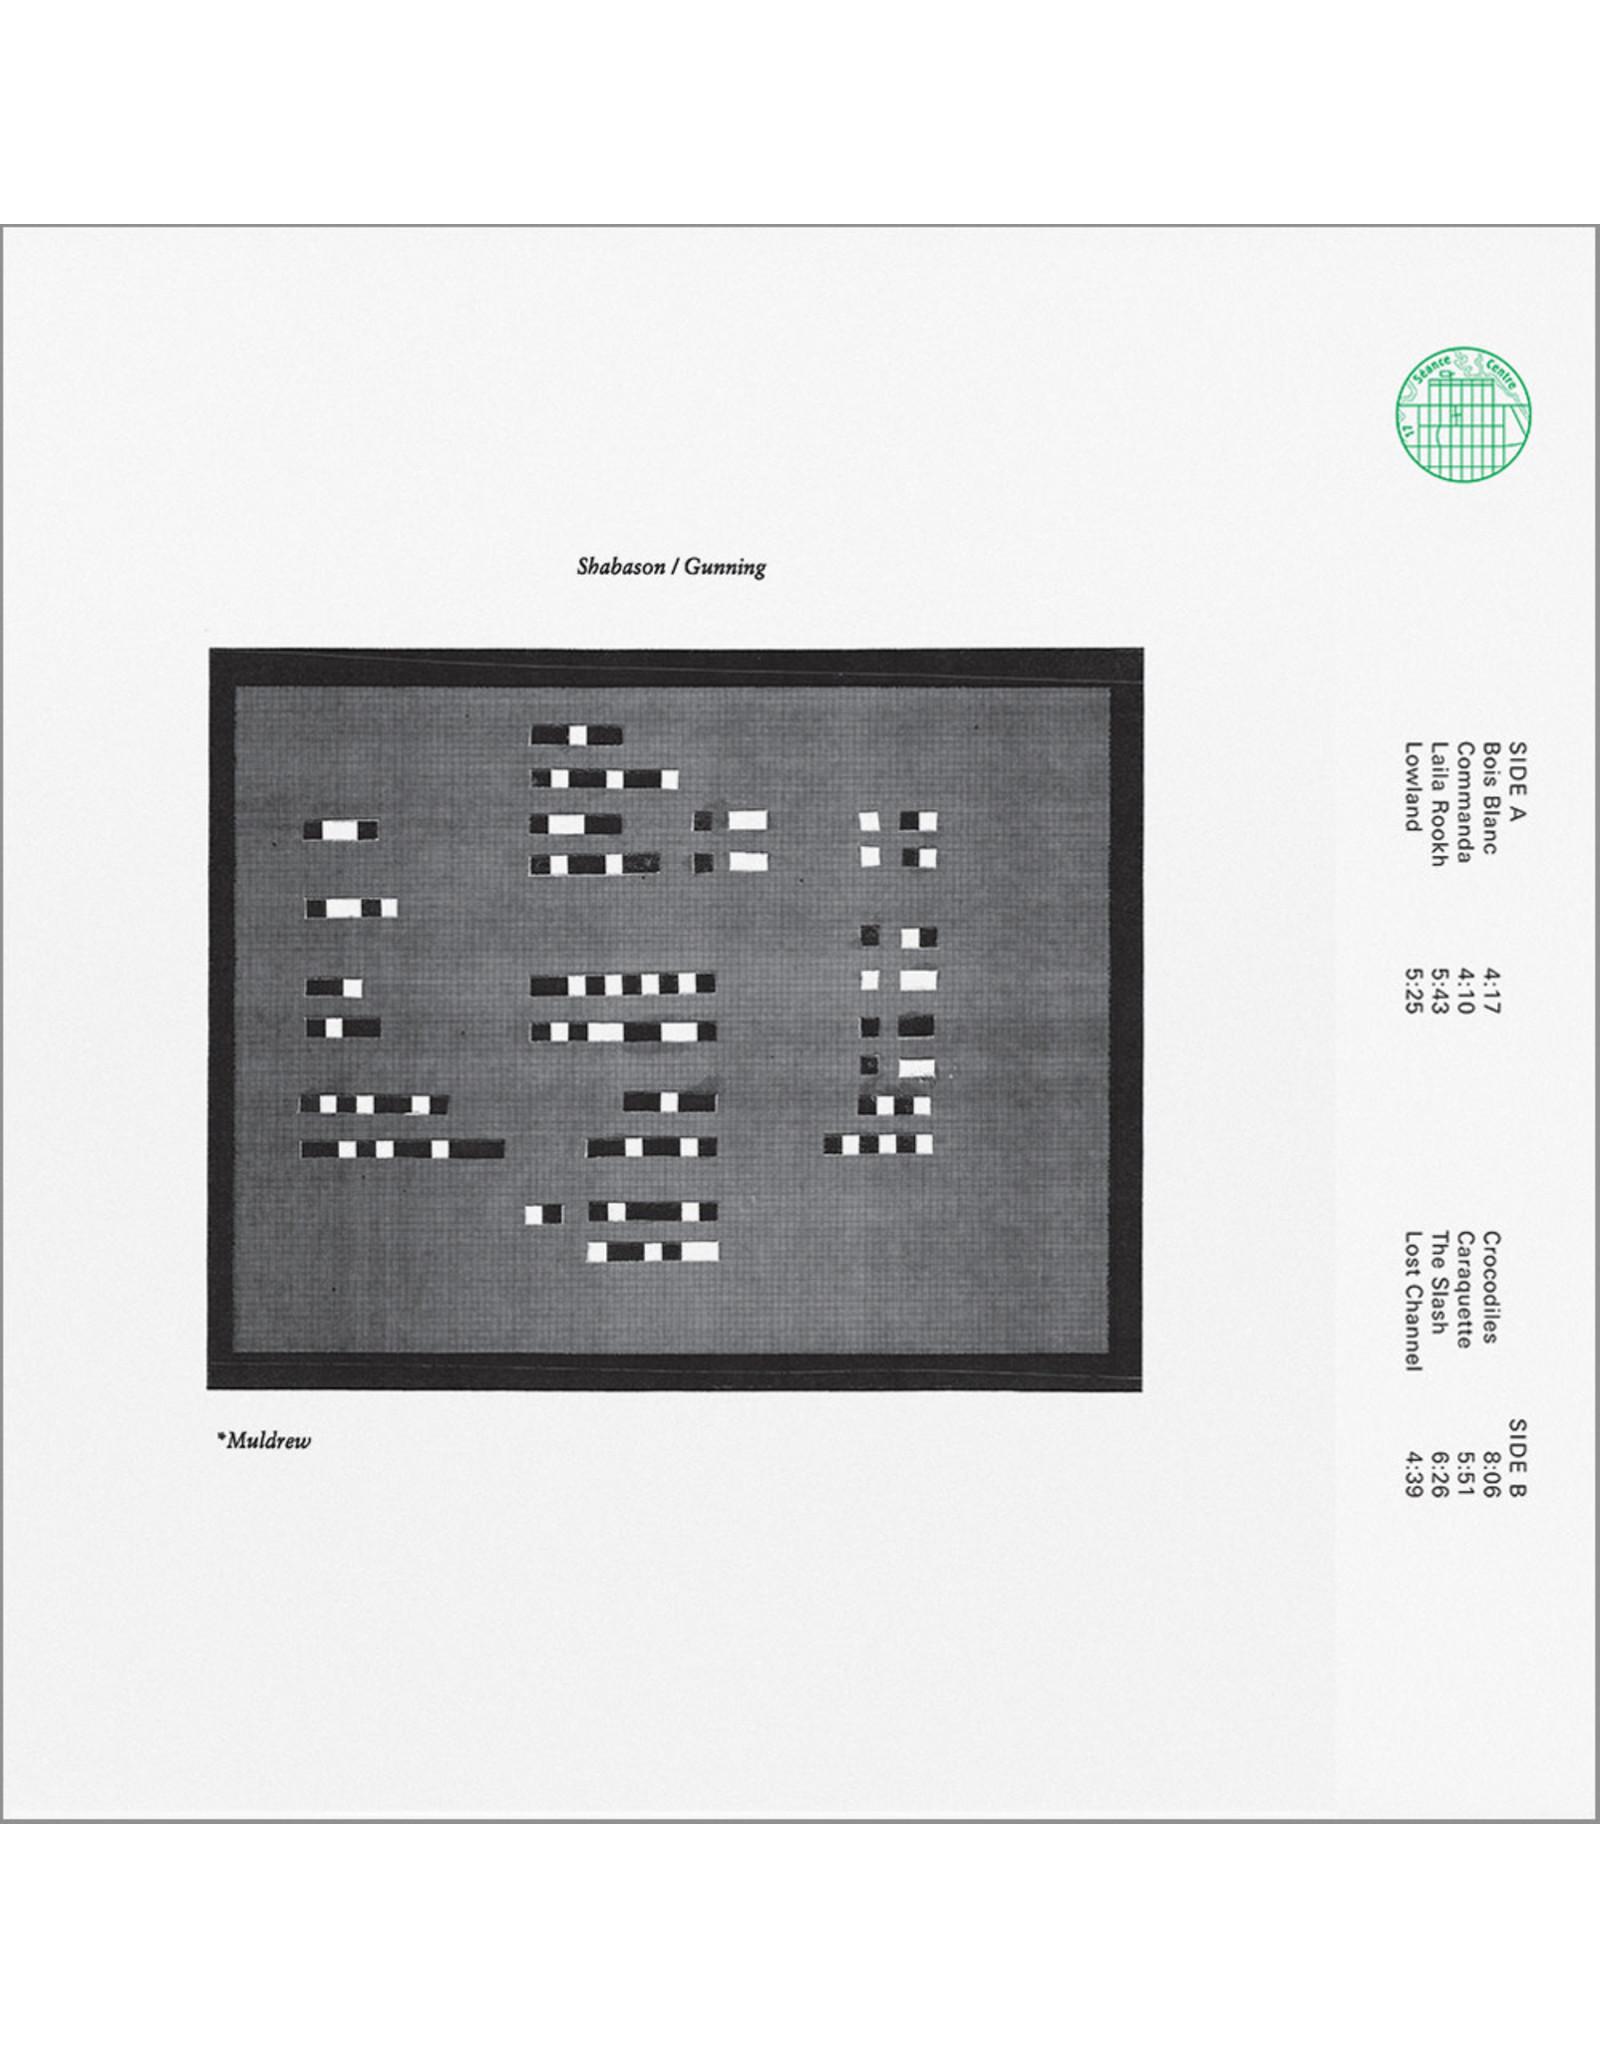 Seance Centre Shabason/Gunning: Muldrew LP